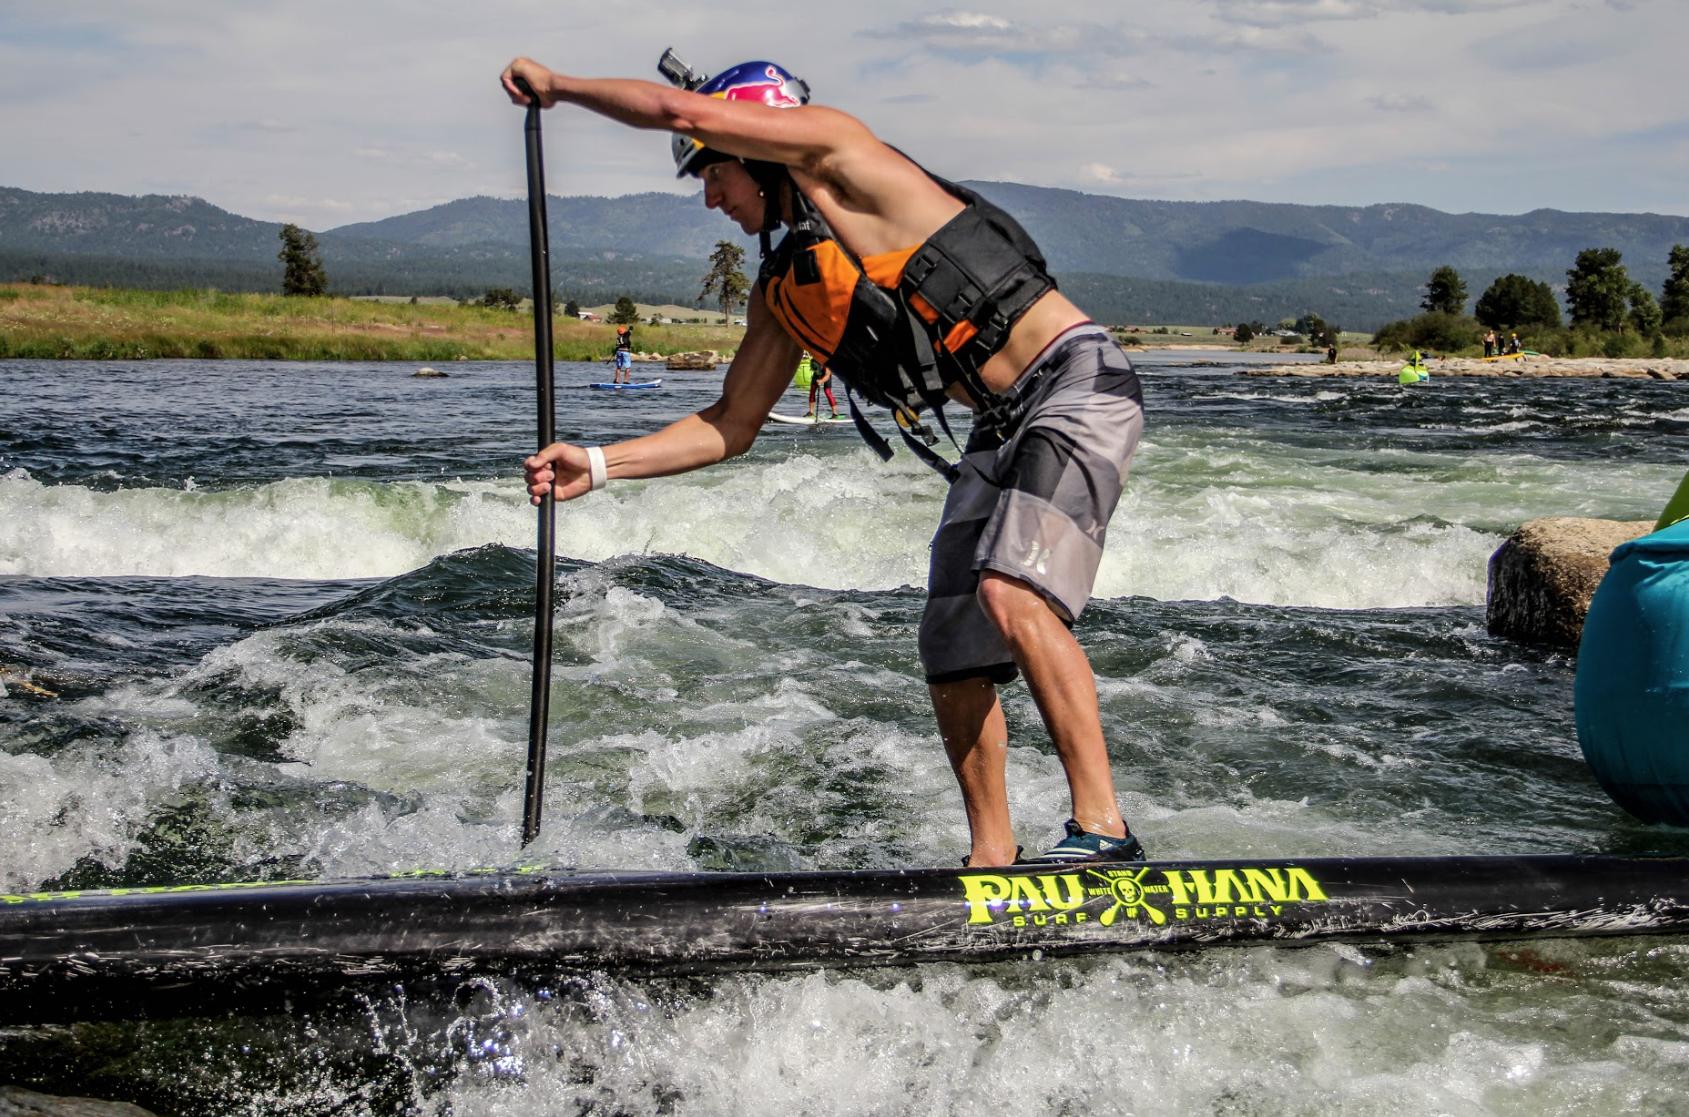 White water SUP racing